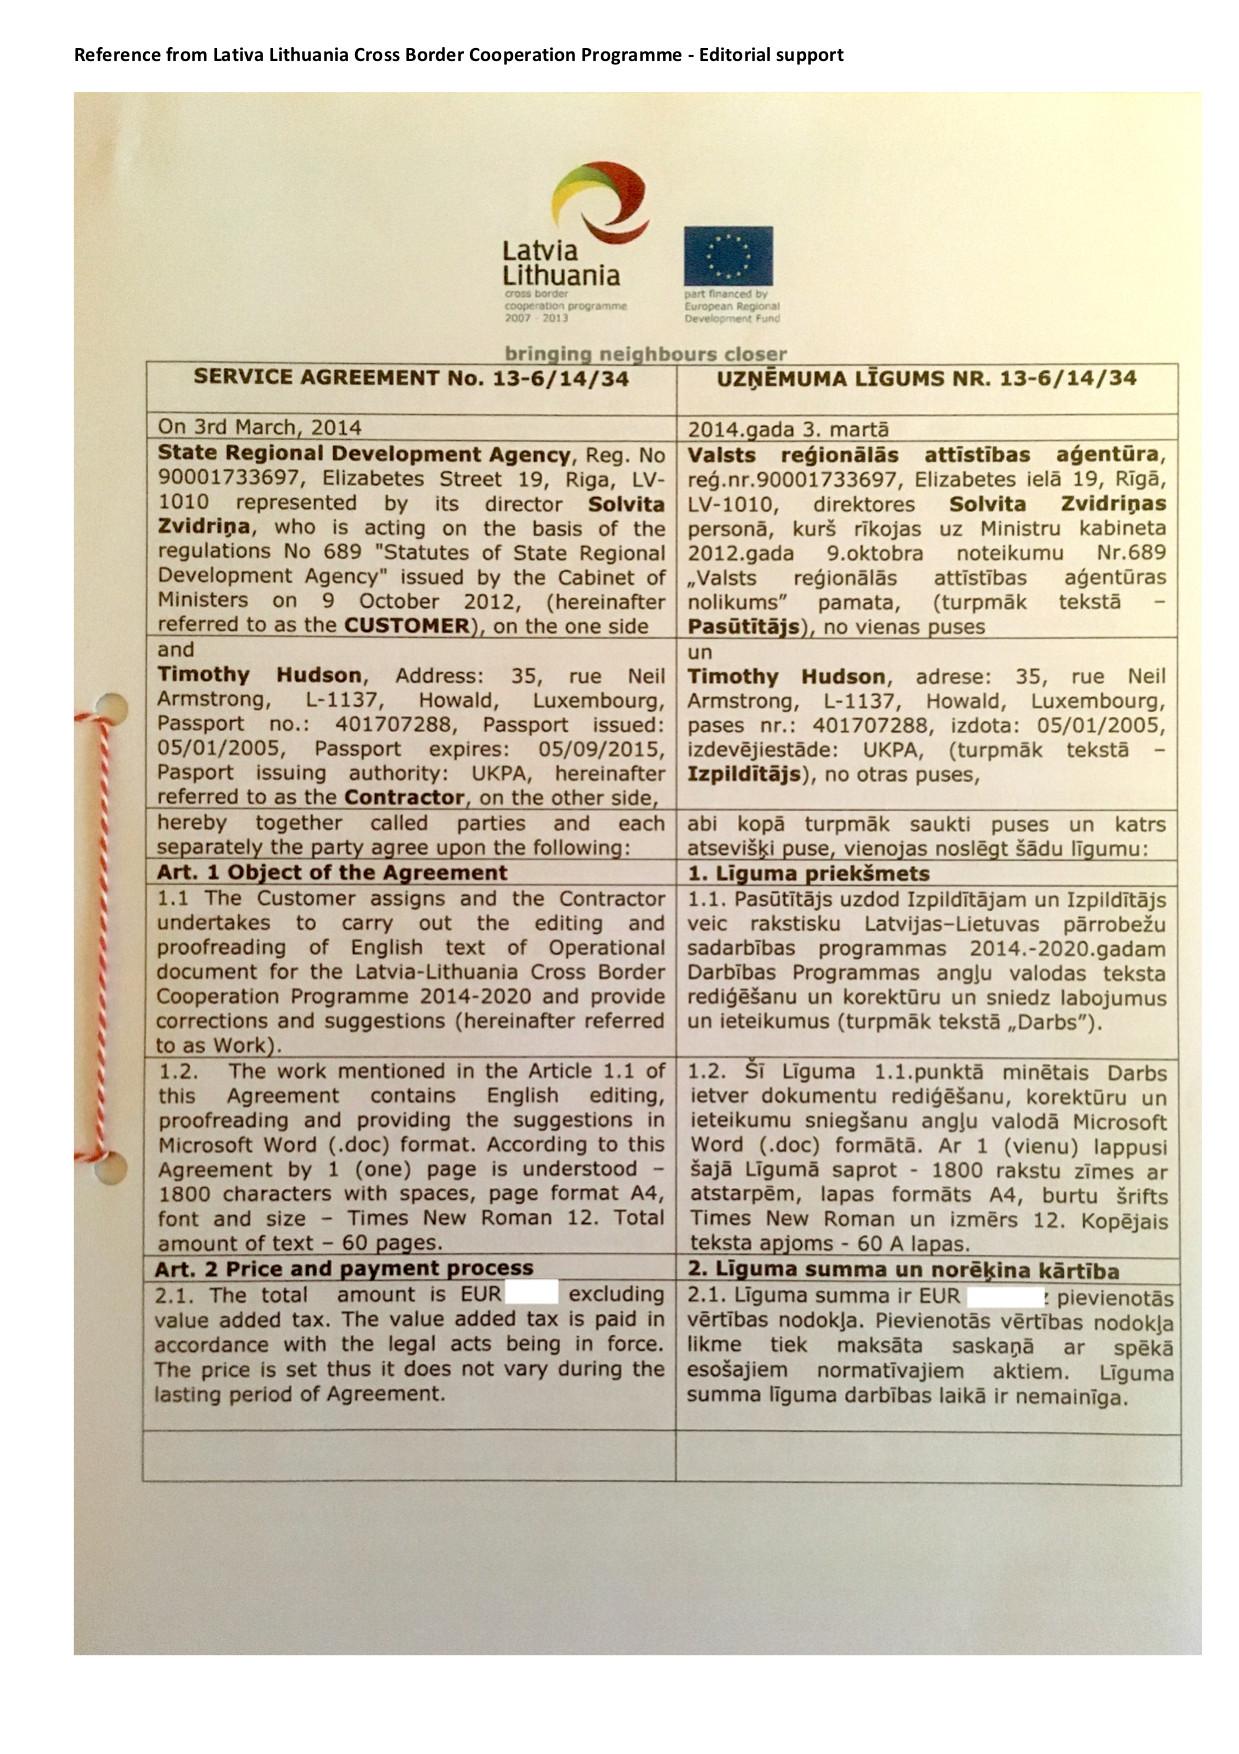 Joint Technical Secretariat of Latvia-Lithuanian Cross Border Cooperation Programme: Editorial expert (2014).